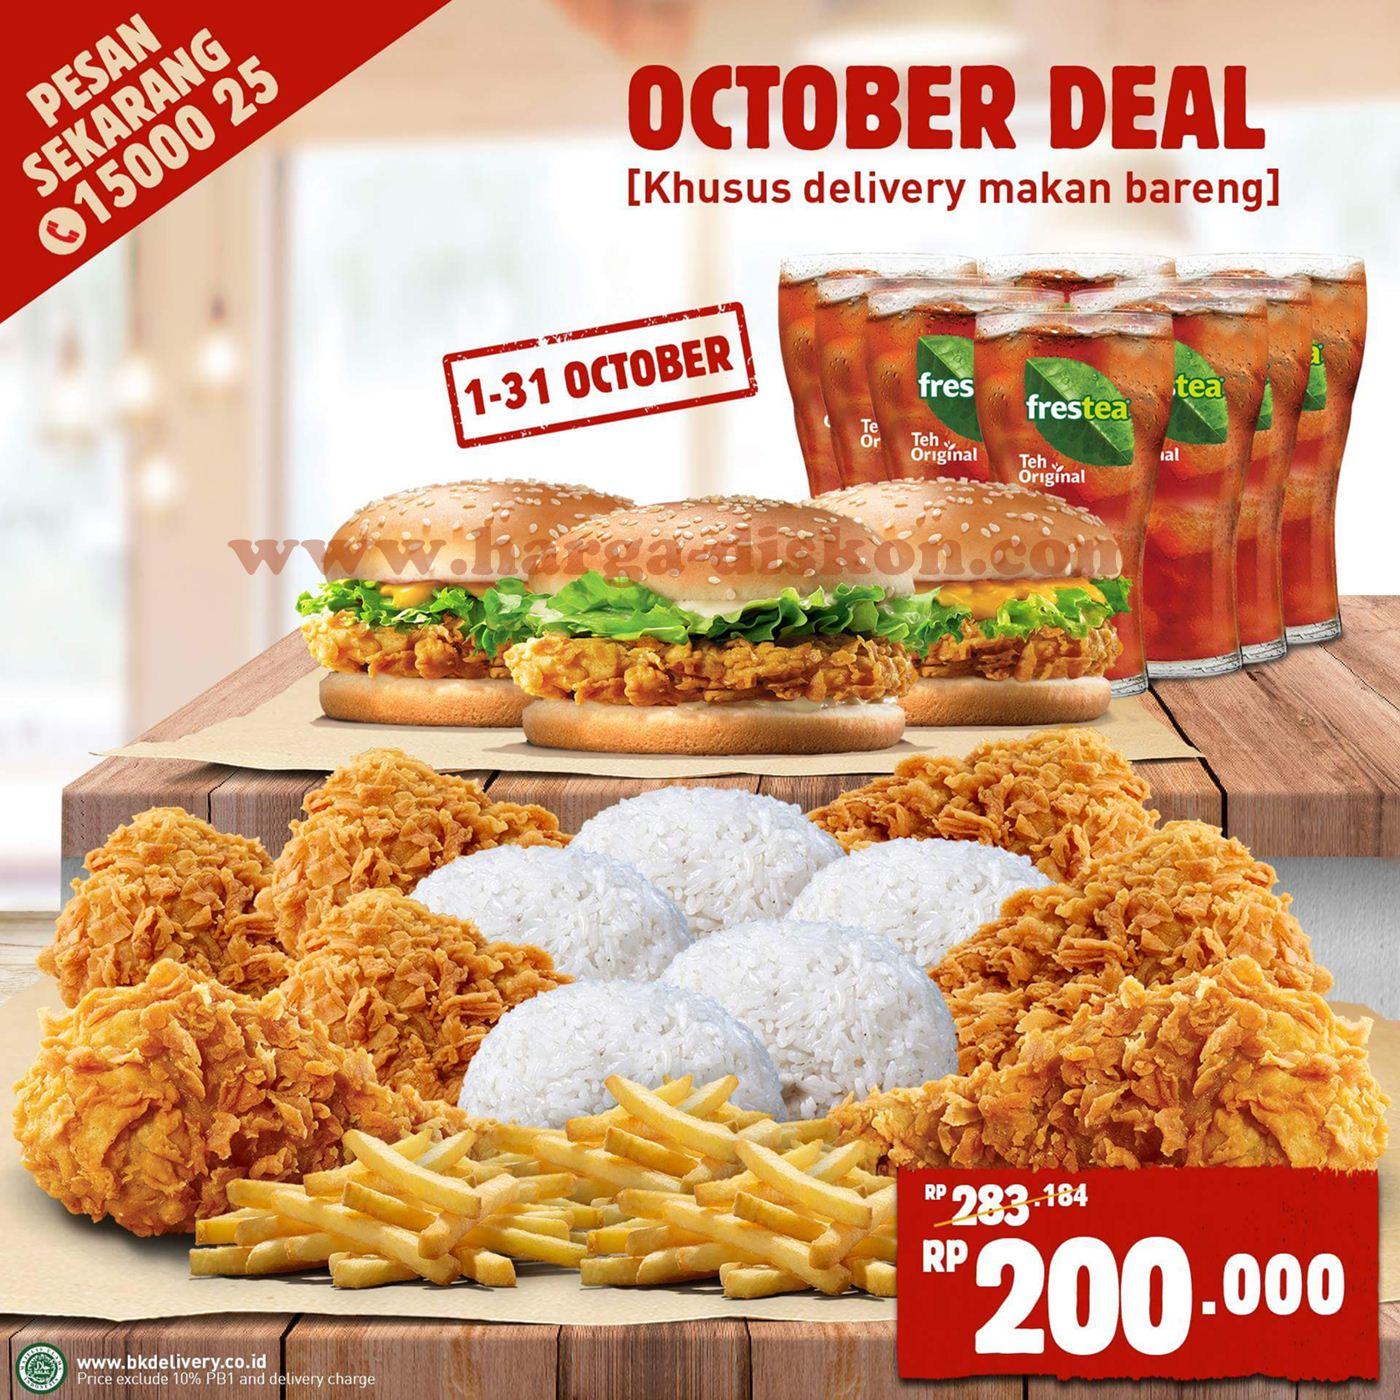 Promo Burger King Terbaru Oktober Deal Rp200 000 Periode 1 31 Oktober 2018 Harga Diskon